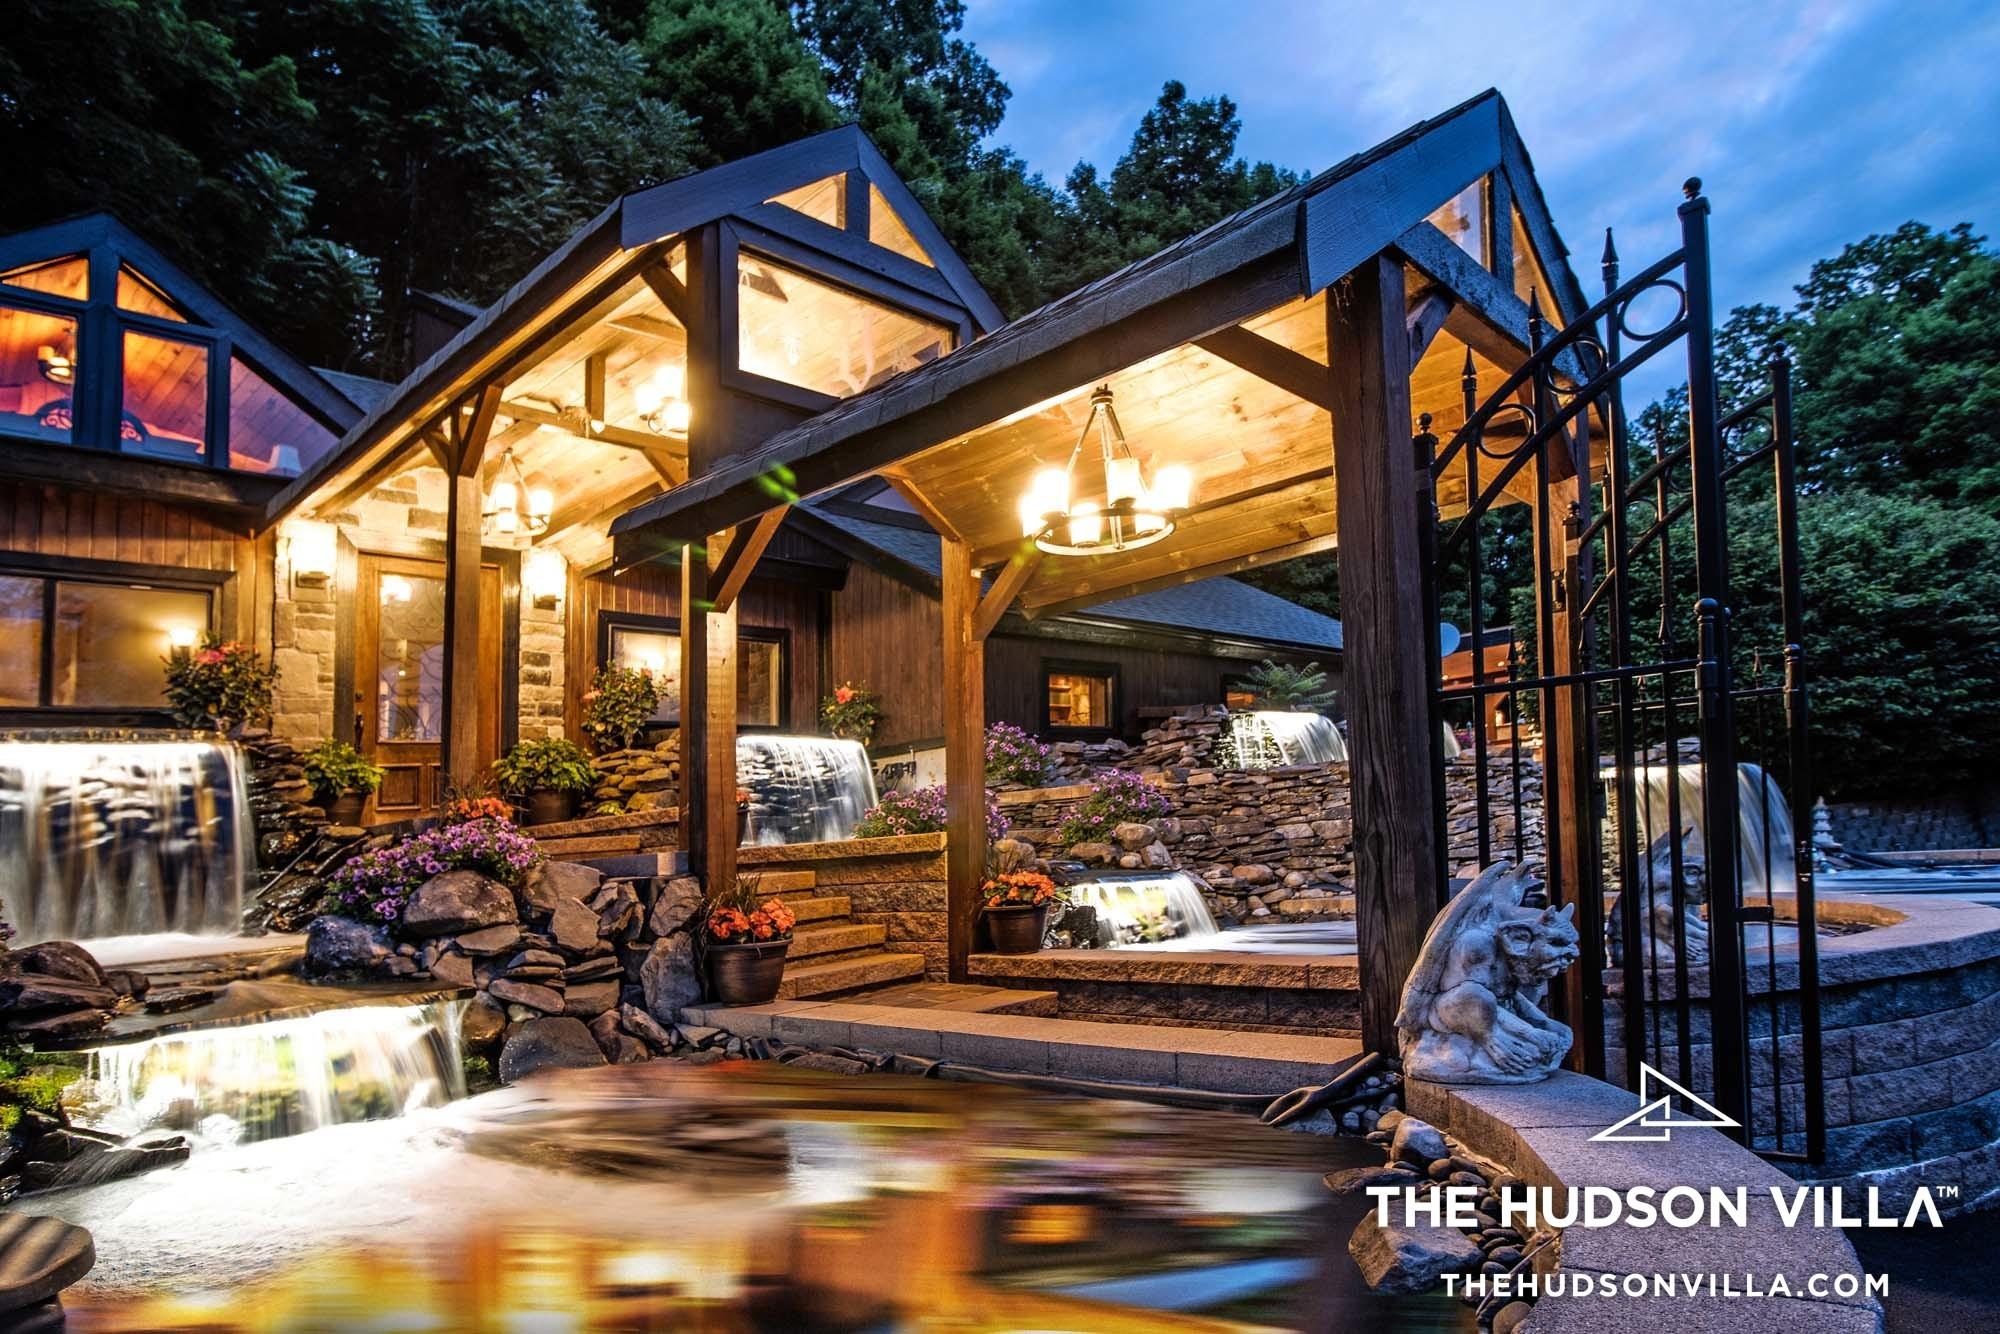 The Hudson Villa - Luxury Hudson Valley Villa for Sale in Chester, NY